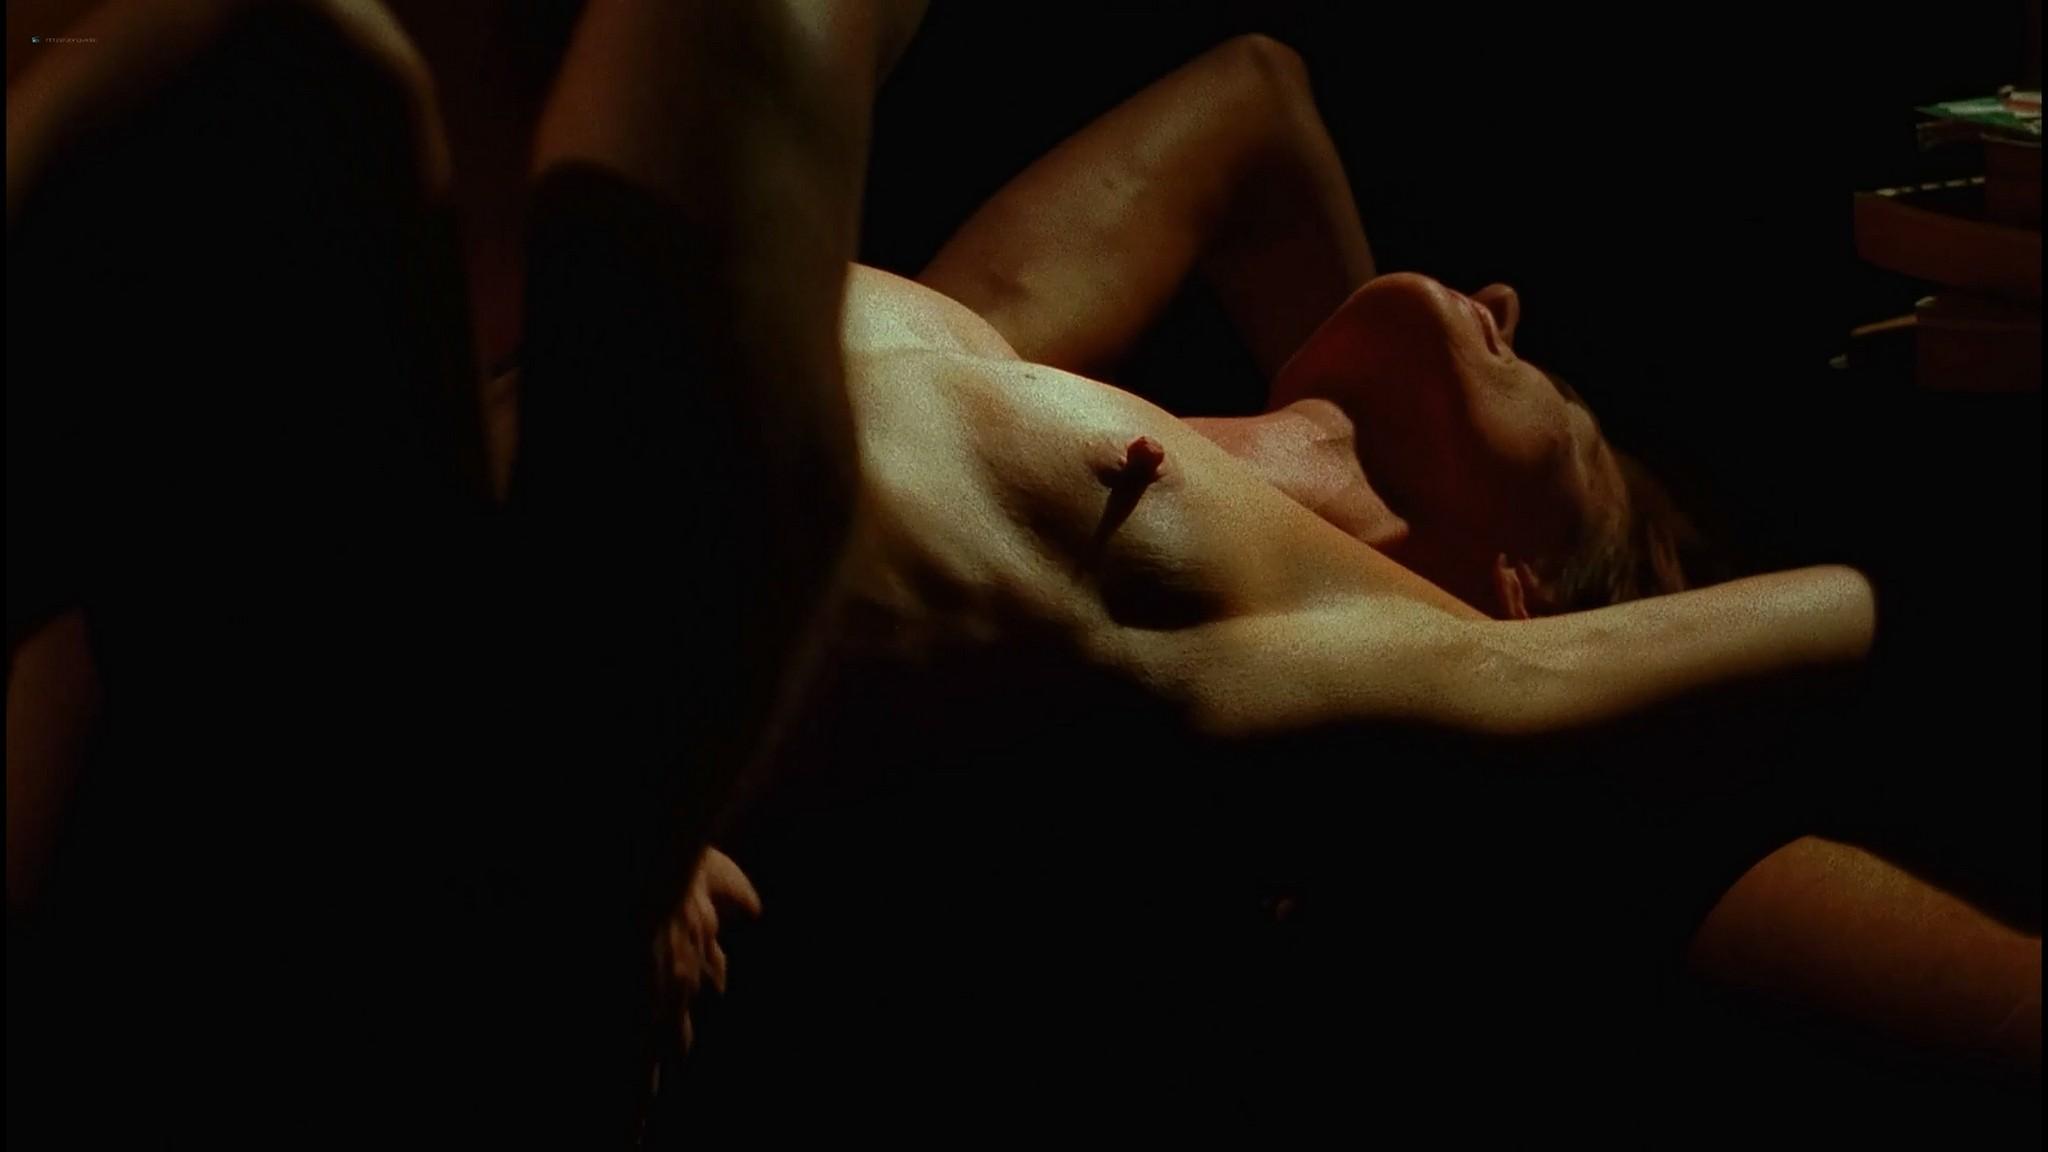 Serena Scott Thomas nude sex Sarah Lassez and others nude too Brothel 2008 1080p Web 2